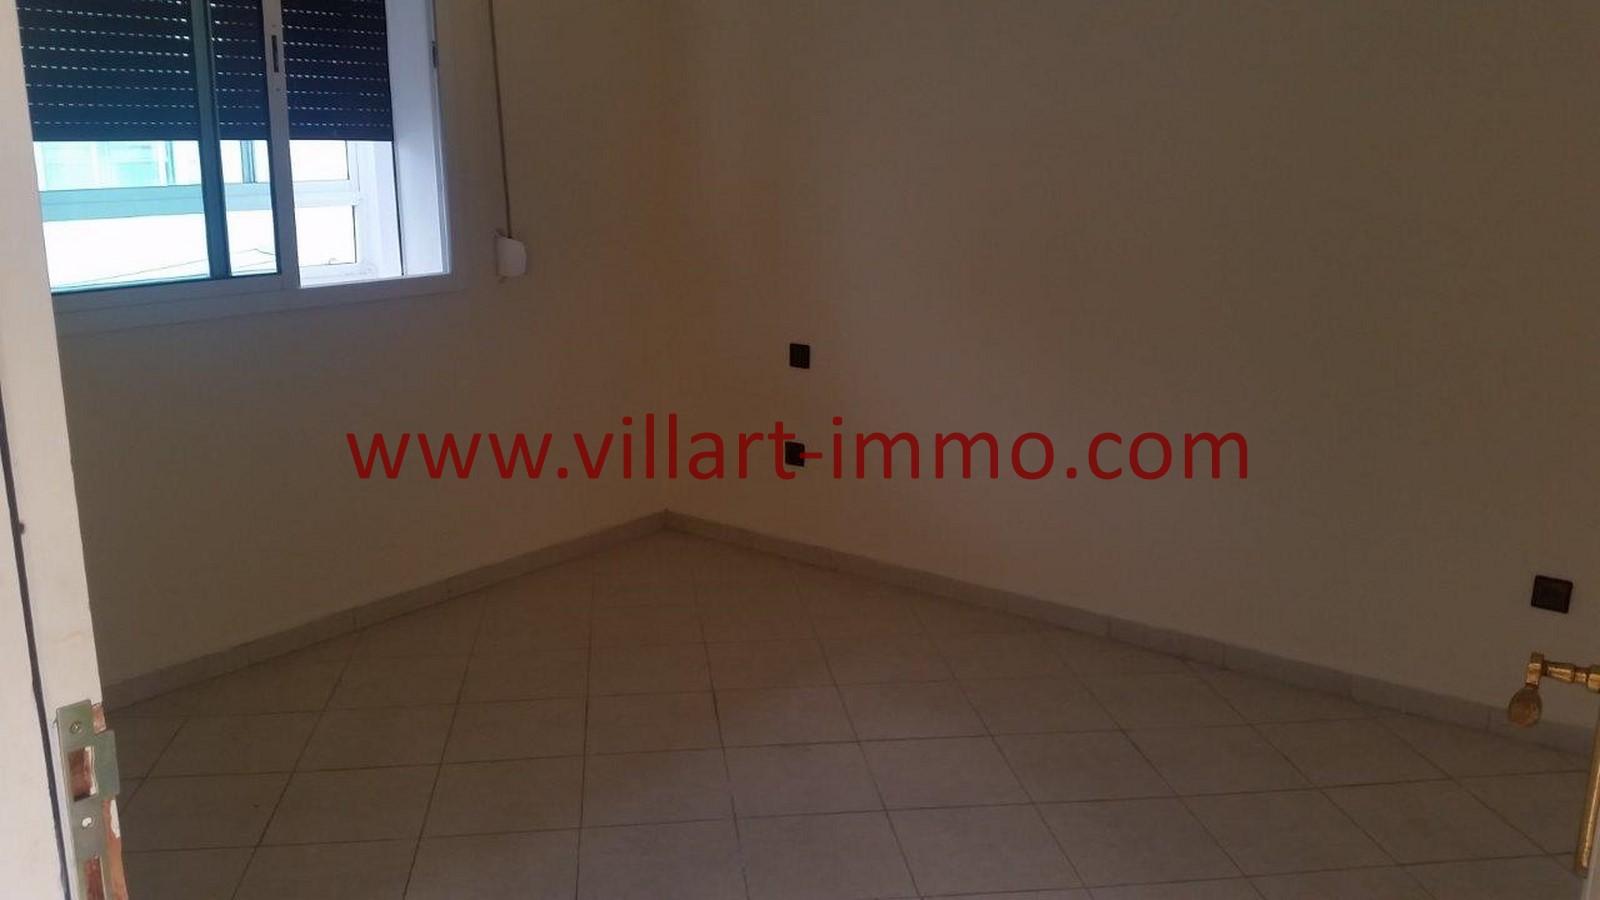 6-location-appartement-meubles-tanger-iberia-chambre-2-l1012-villart-immo-maroc